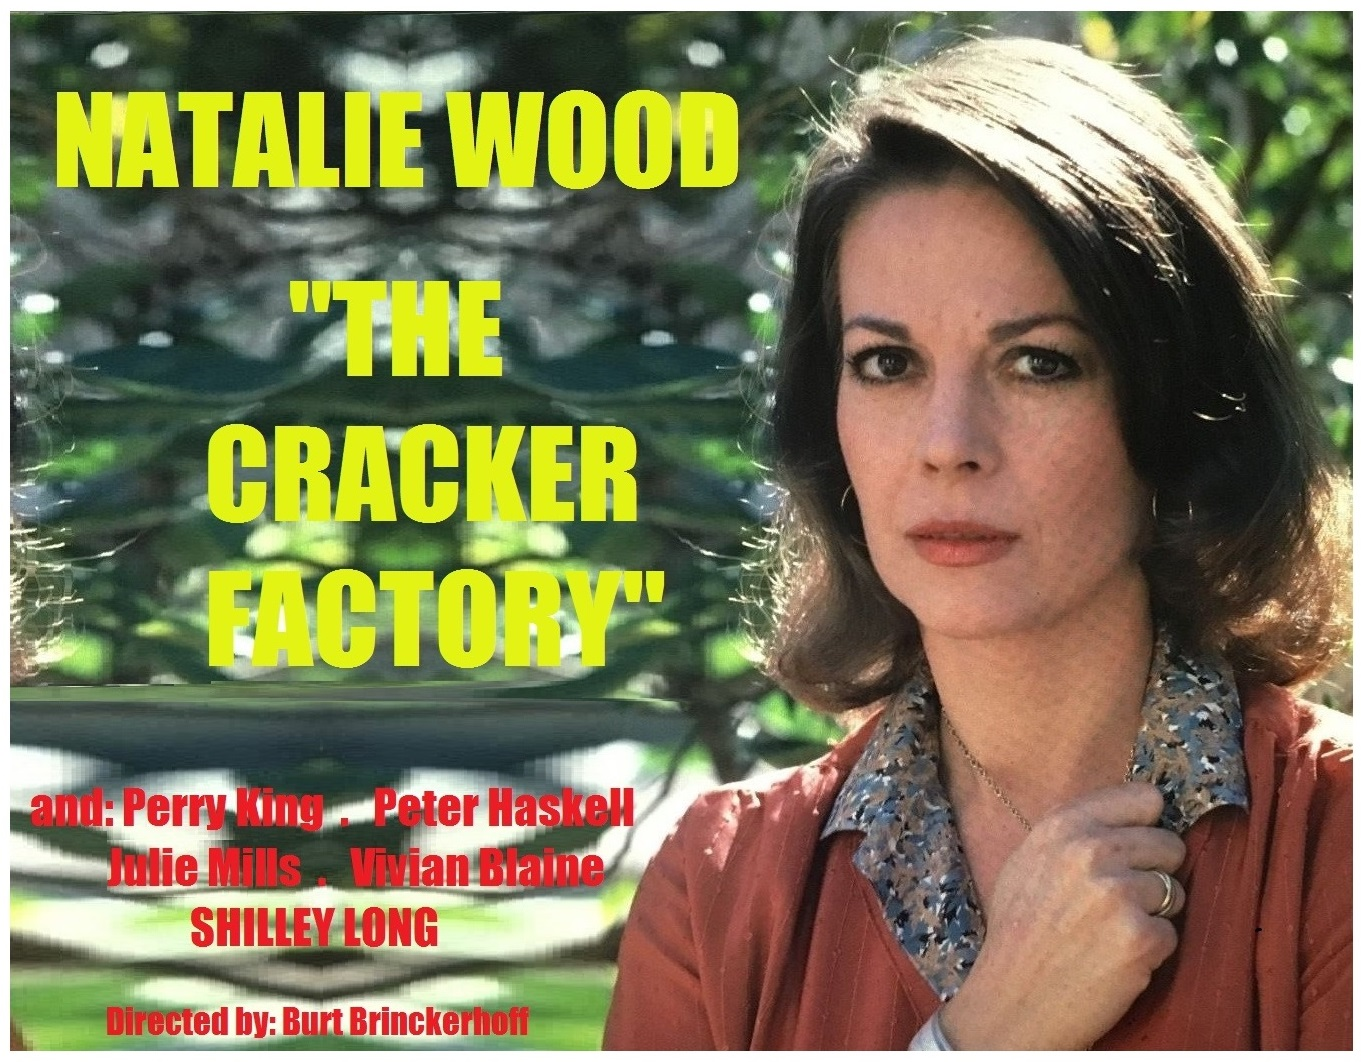 THE CRACKER FACTORY (1979) WEB SITE